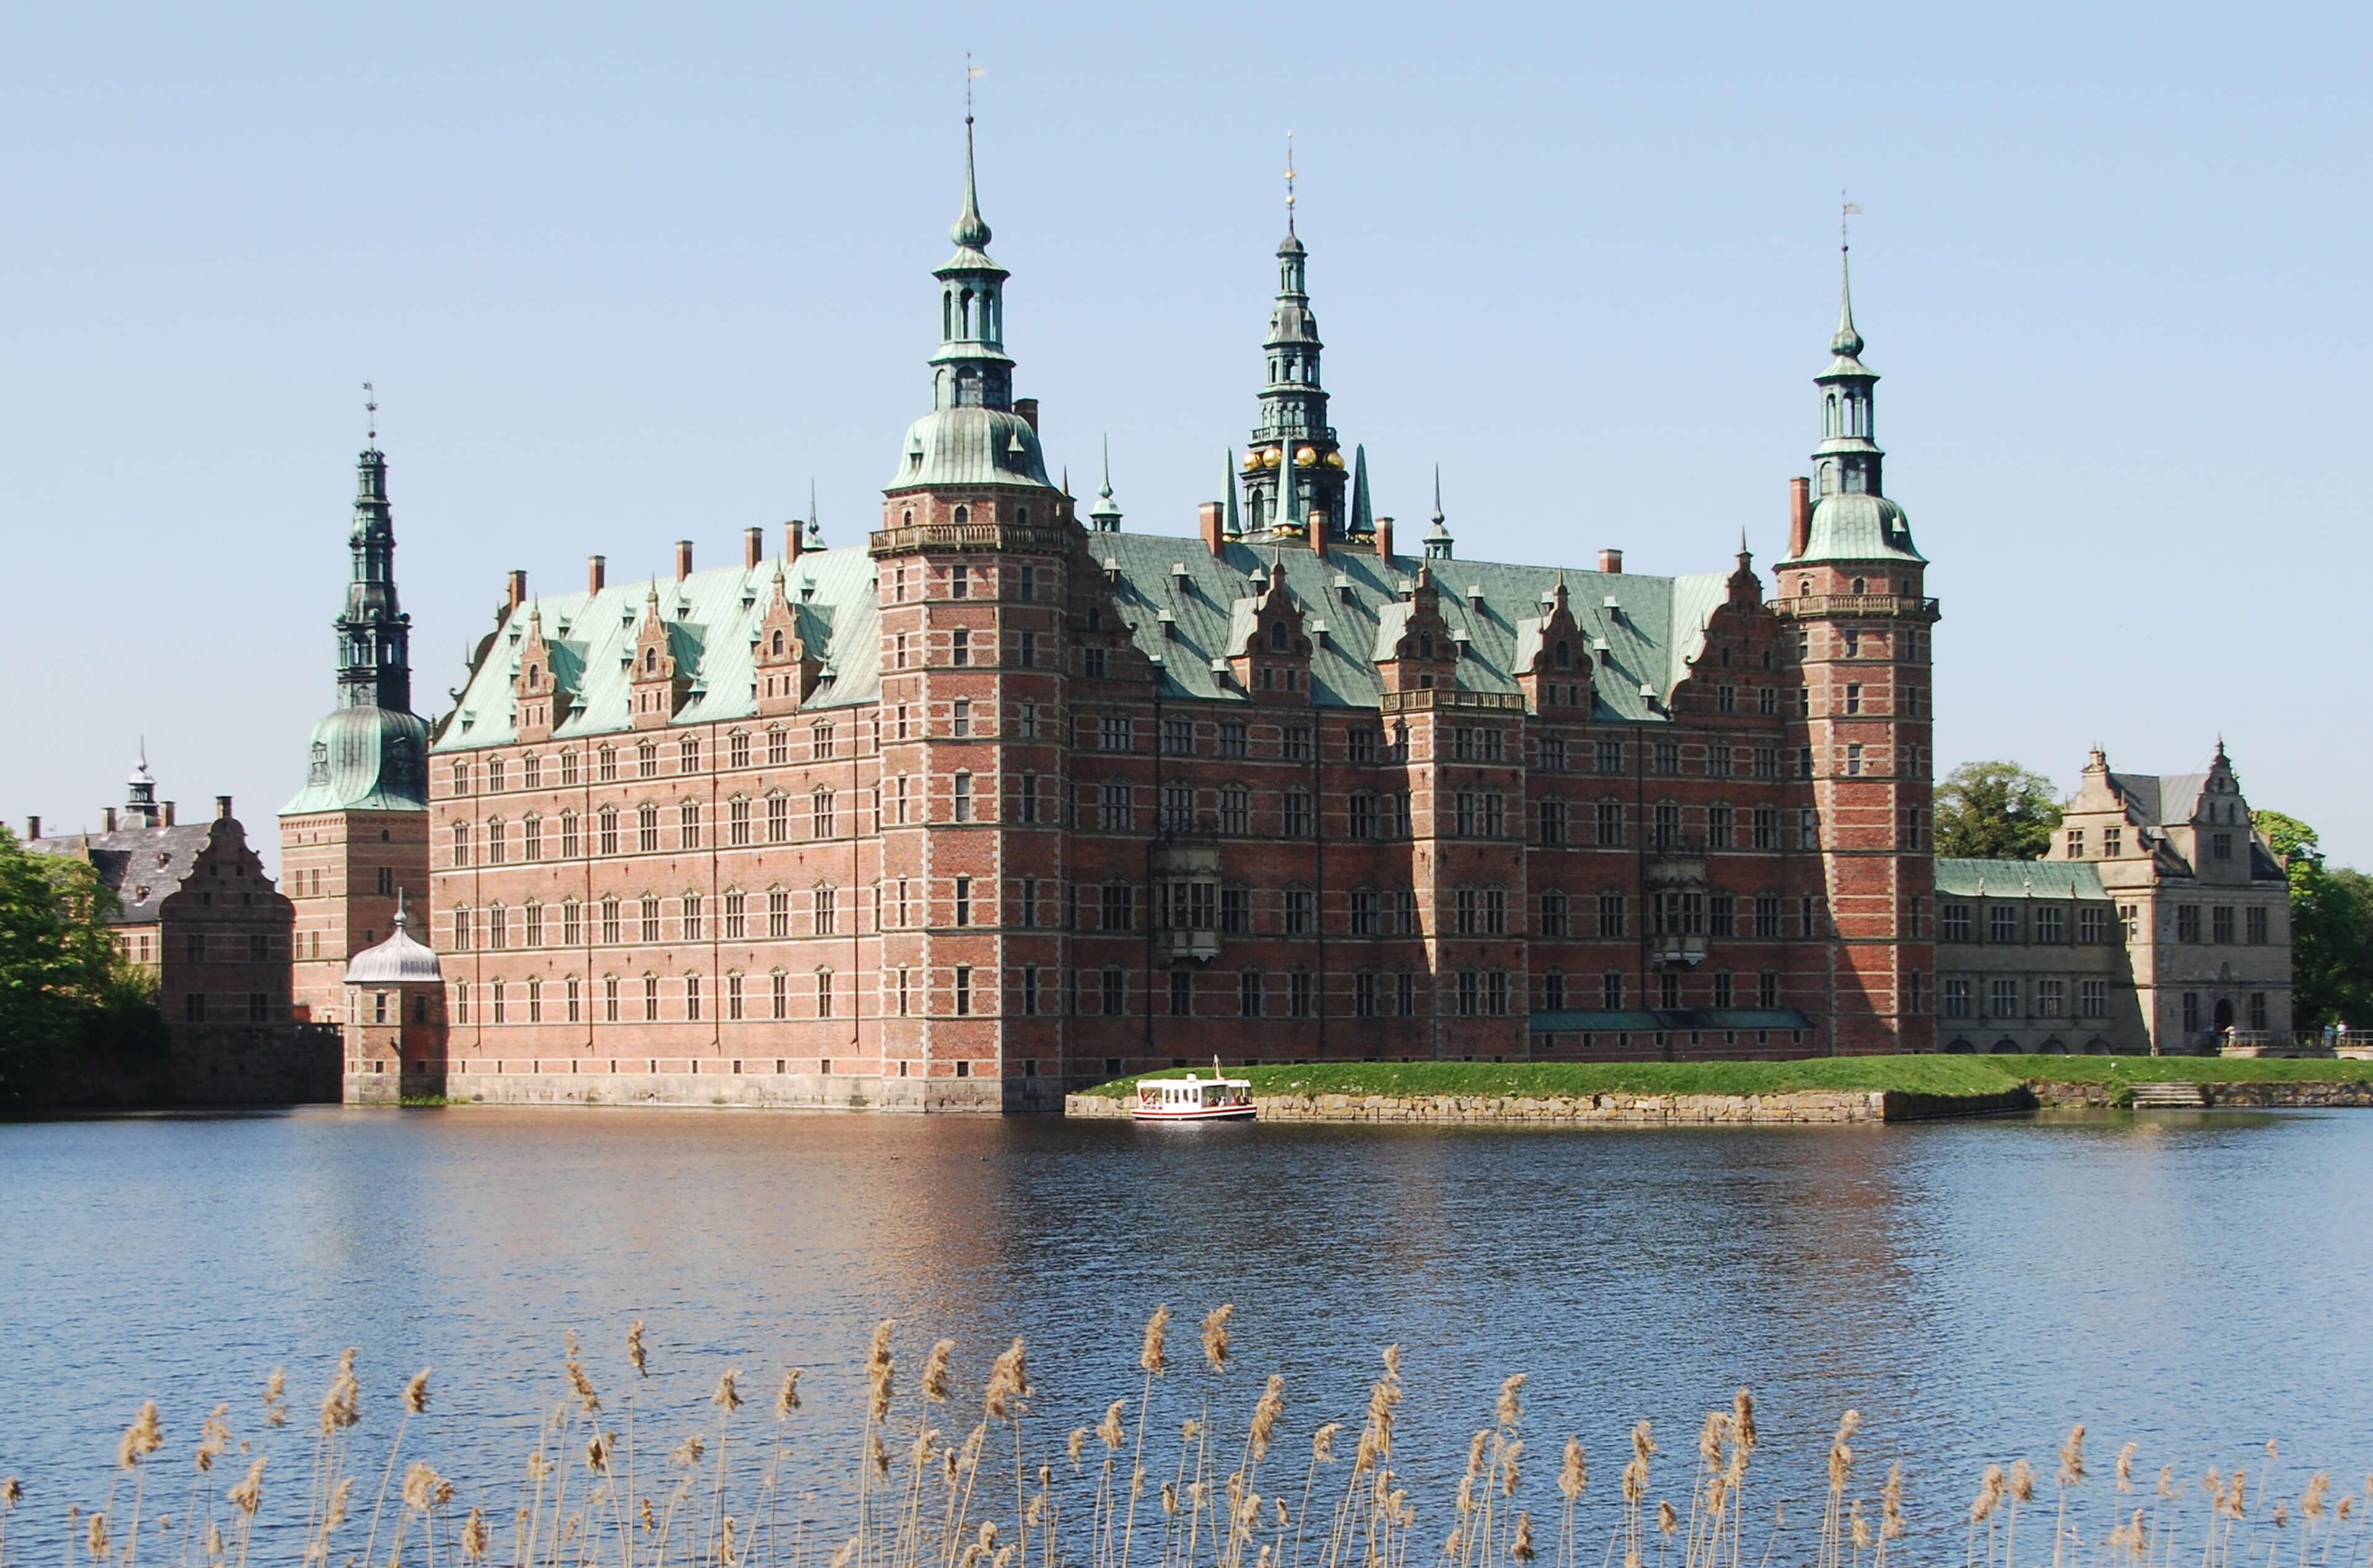 Castle Frederiksborg